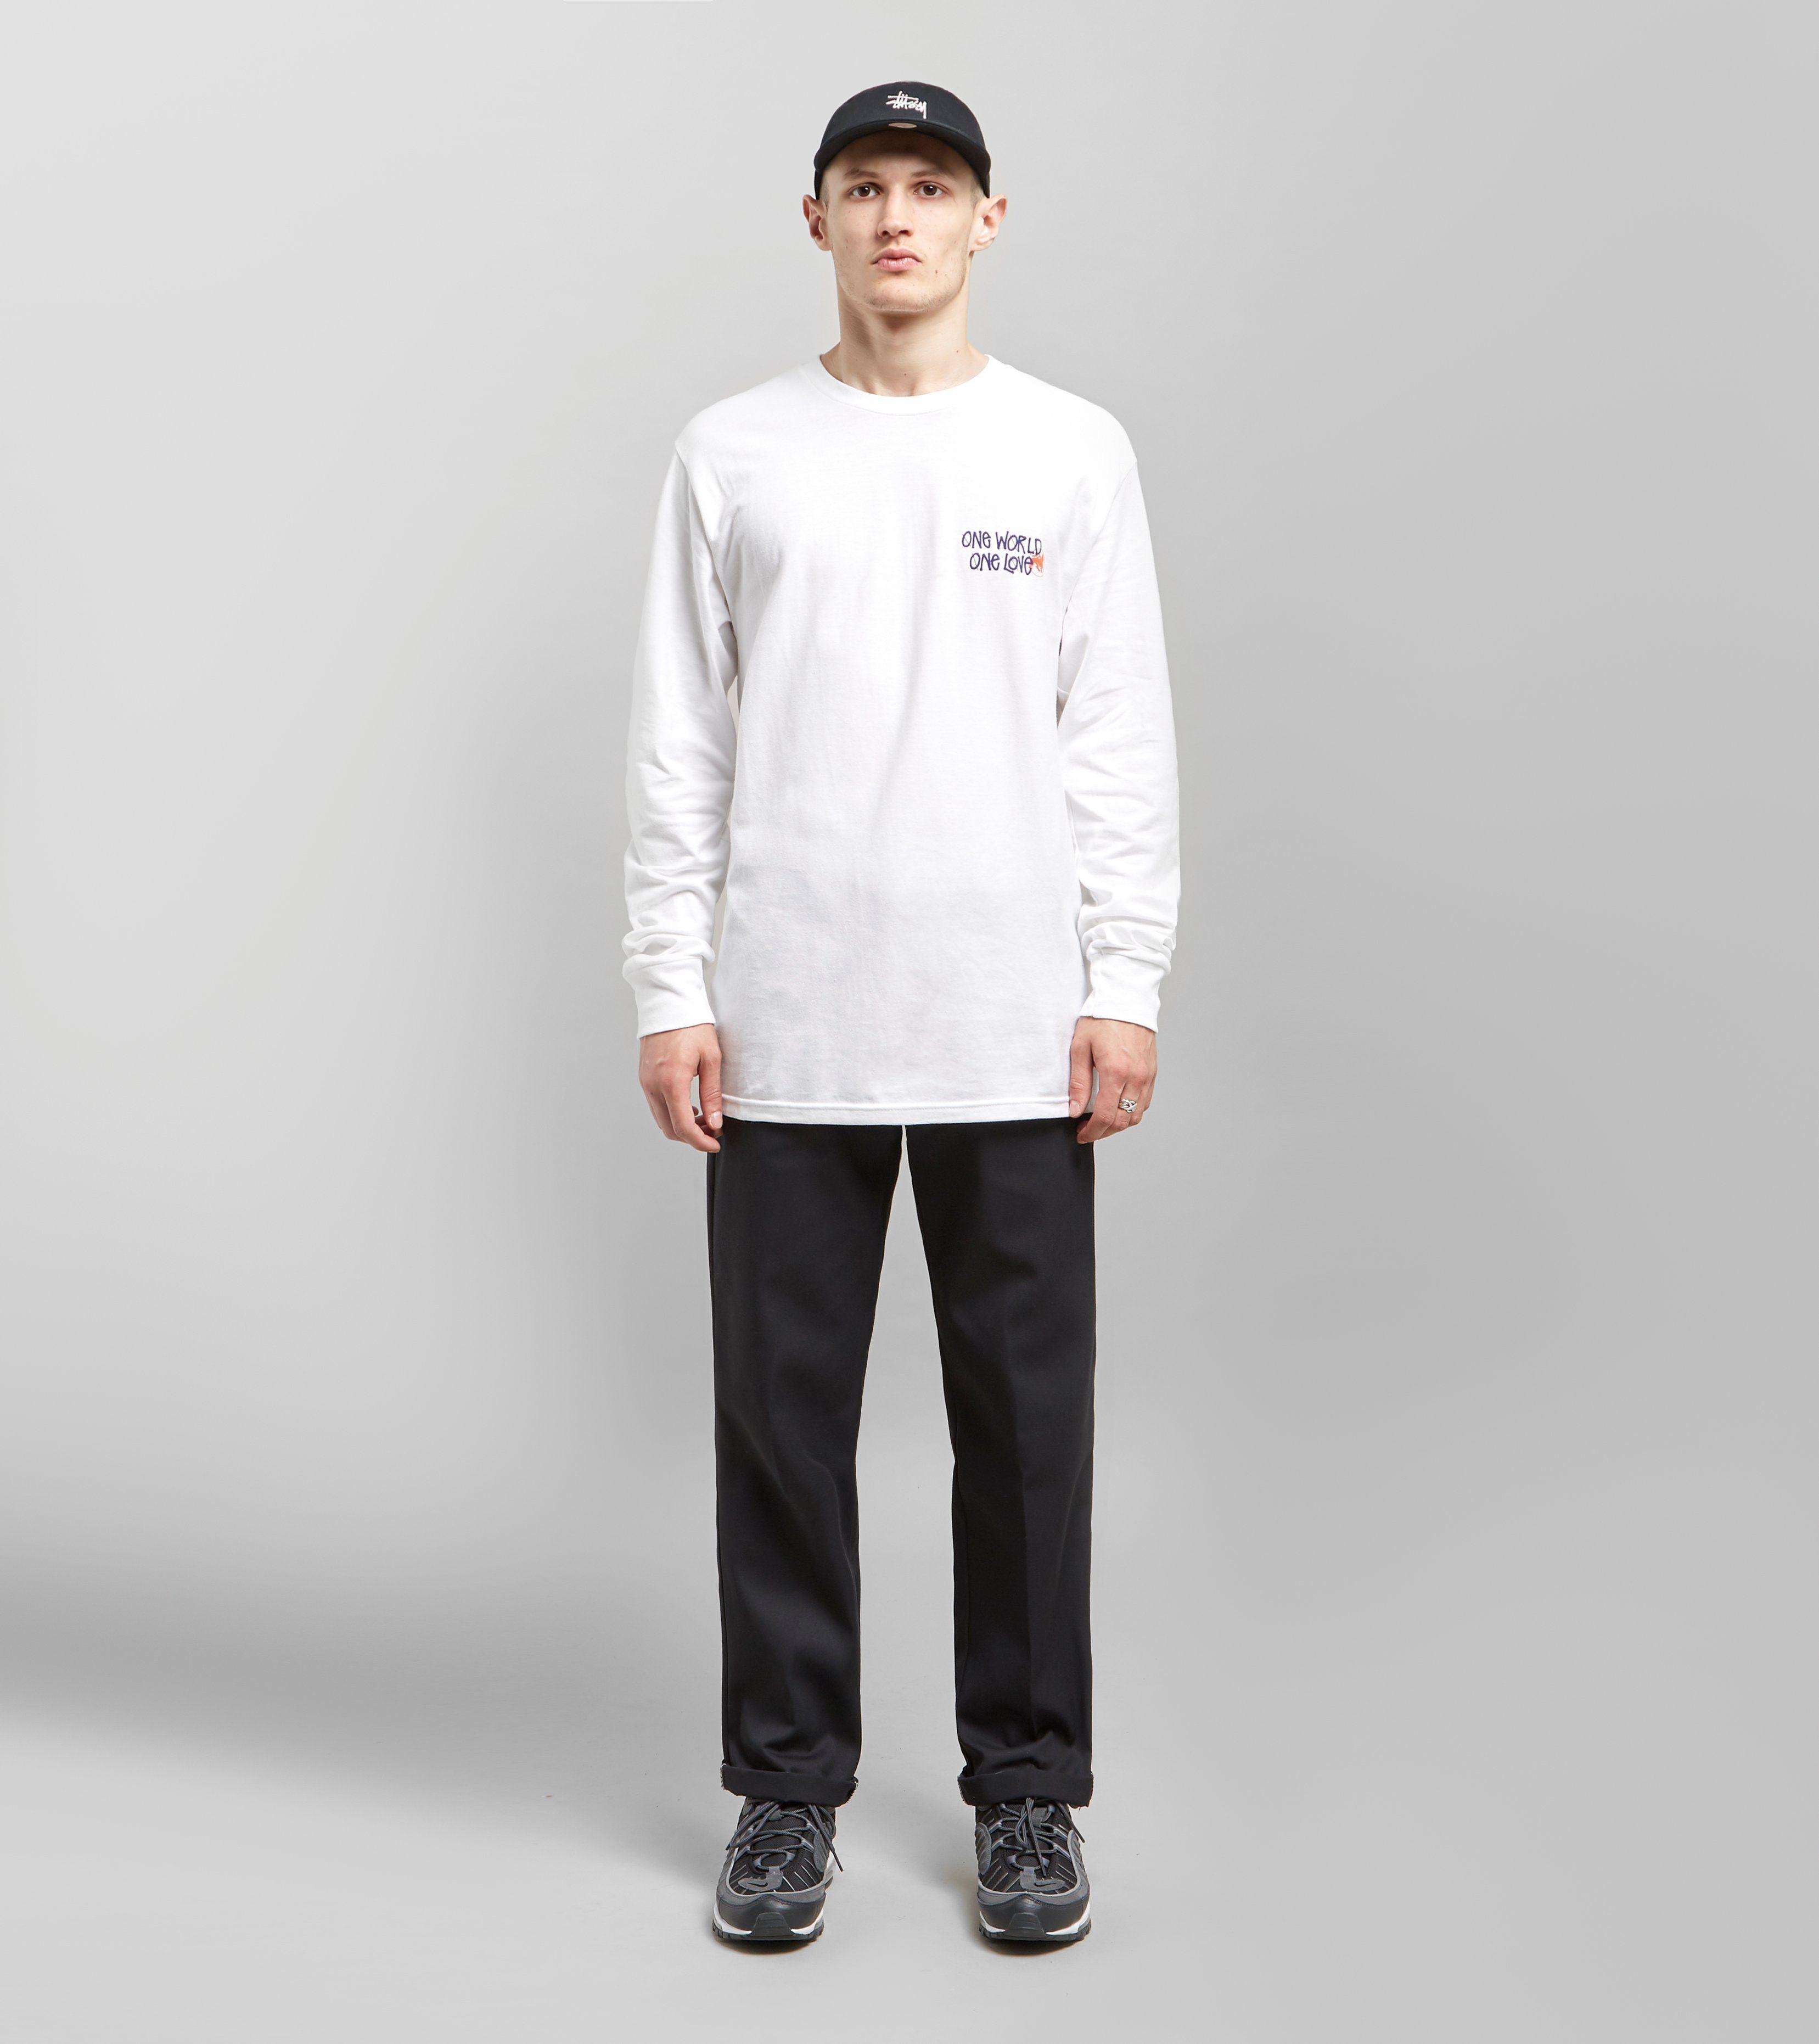 Stussy One World Long Sleeved T-Shirt